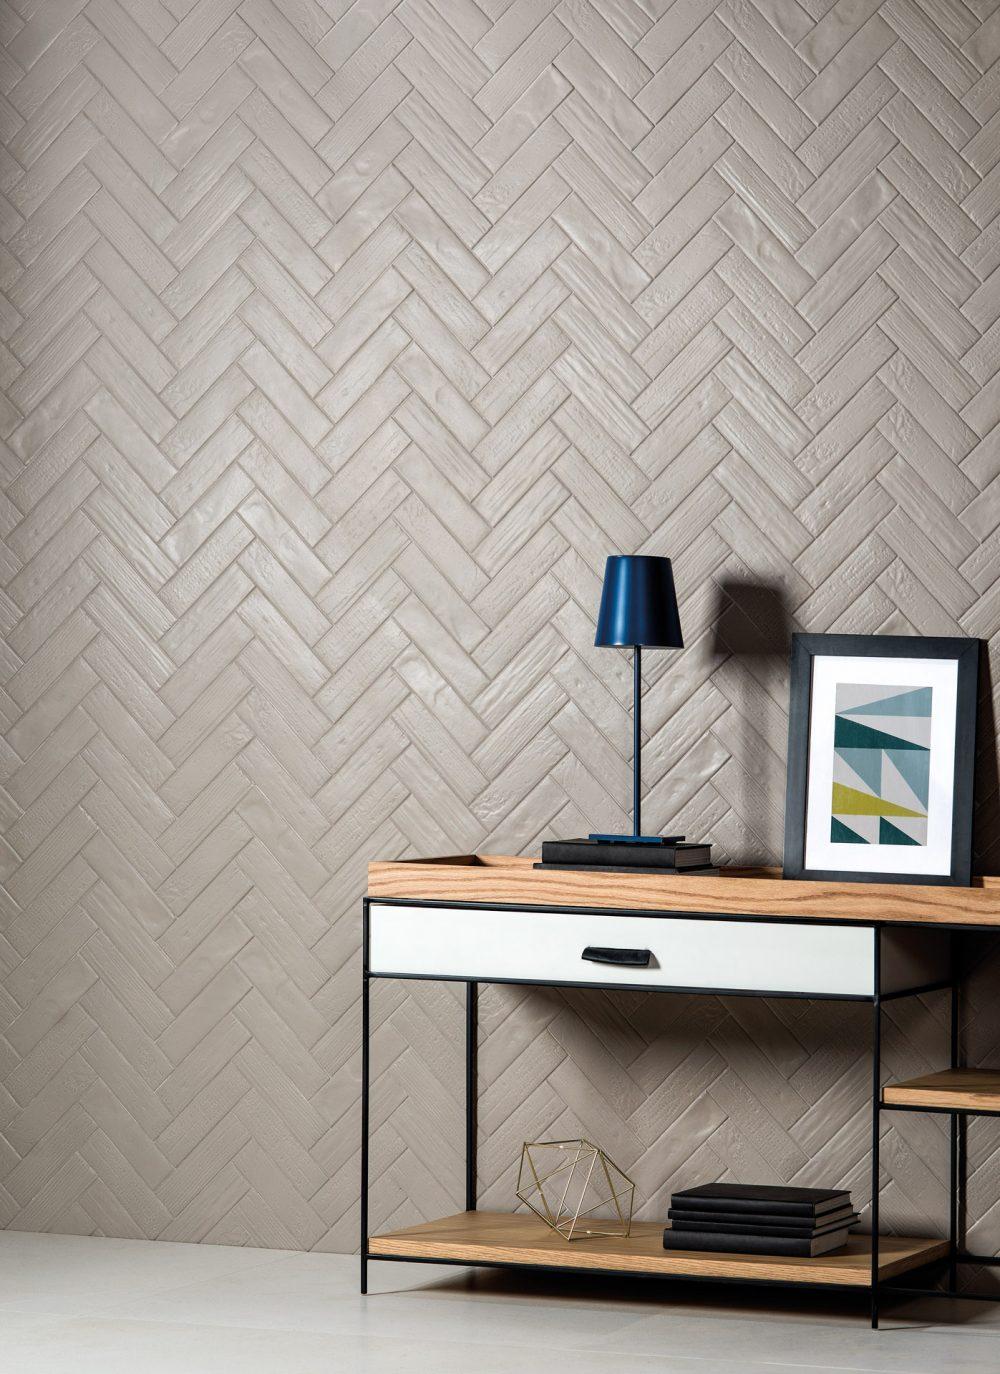 cerâmica para parede - sala de estar com parede de cerâmica